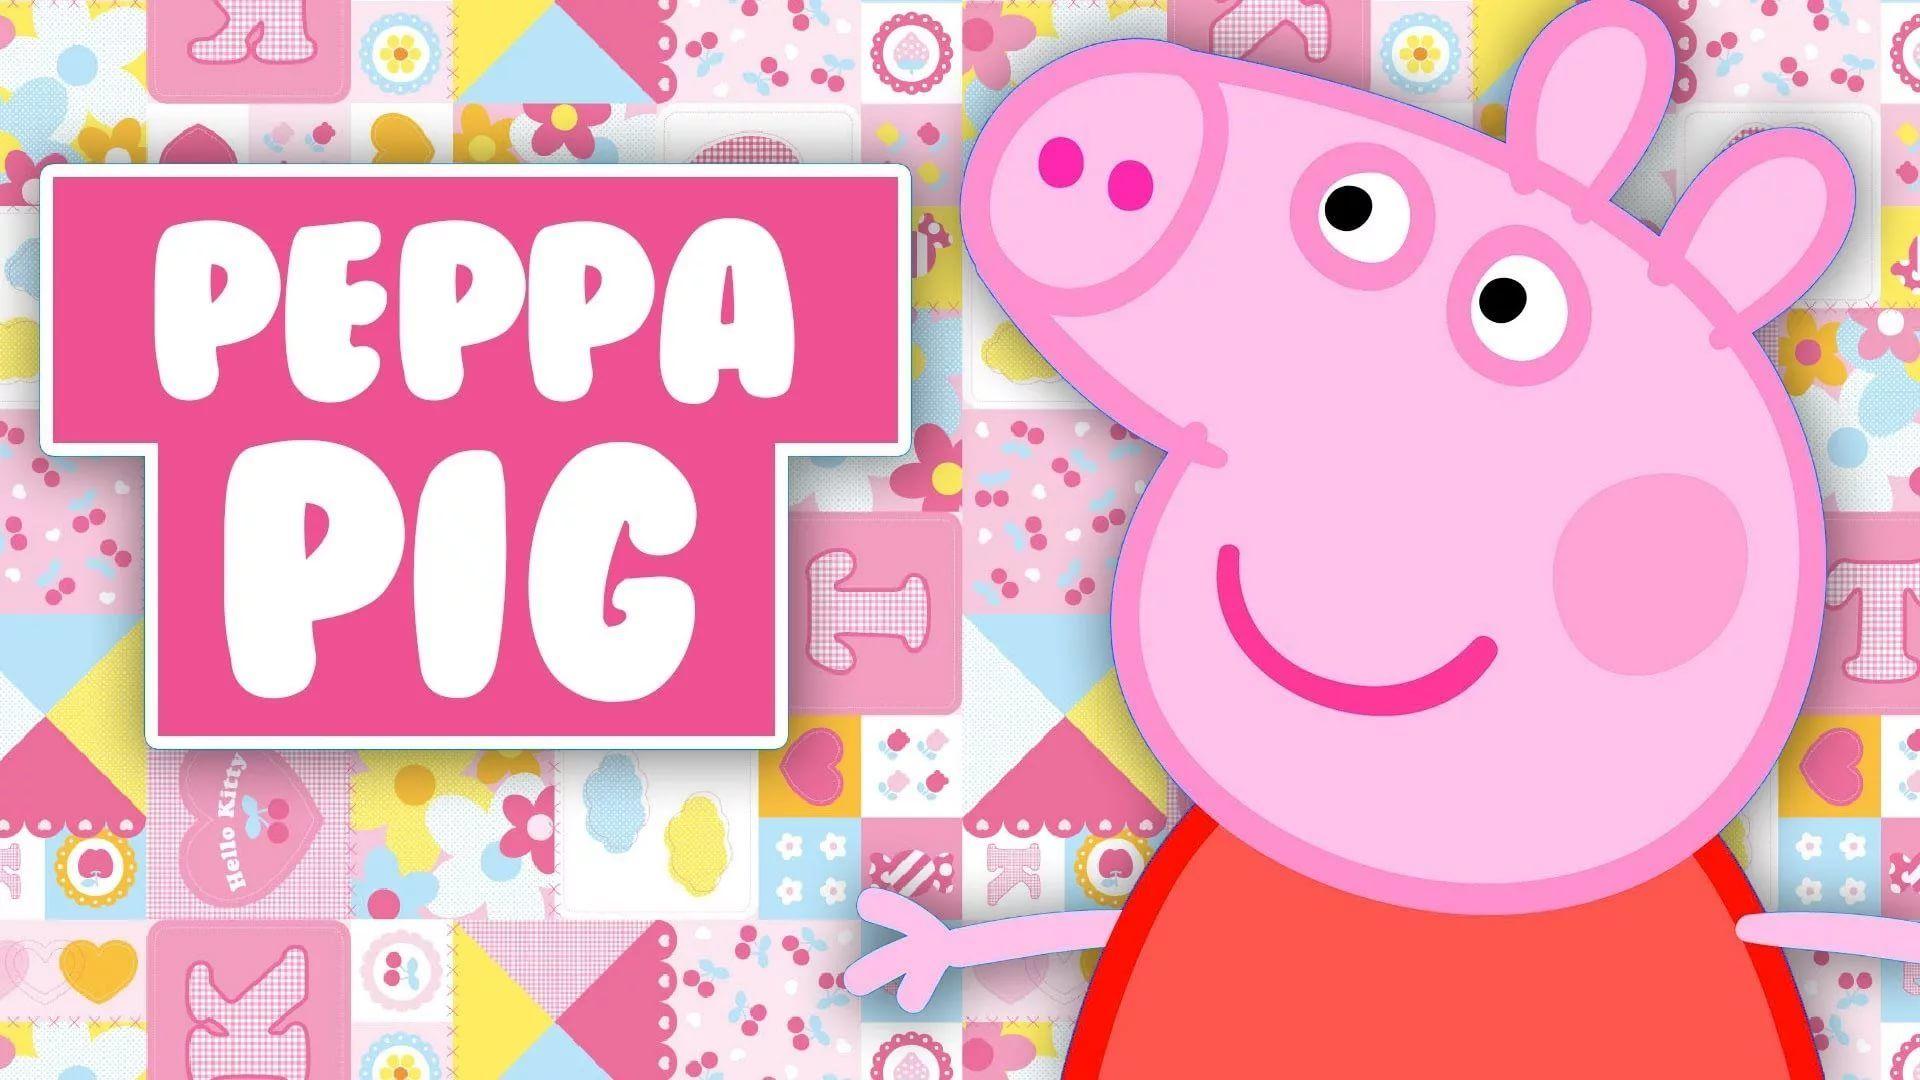 Peppa Pig free download wallpaper